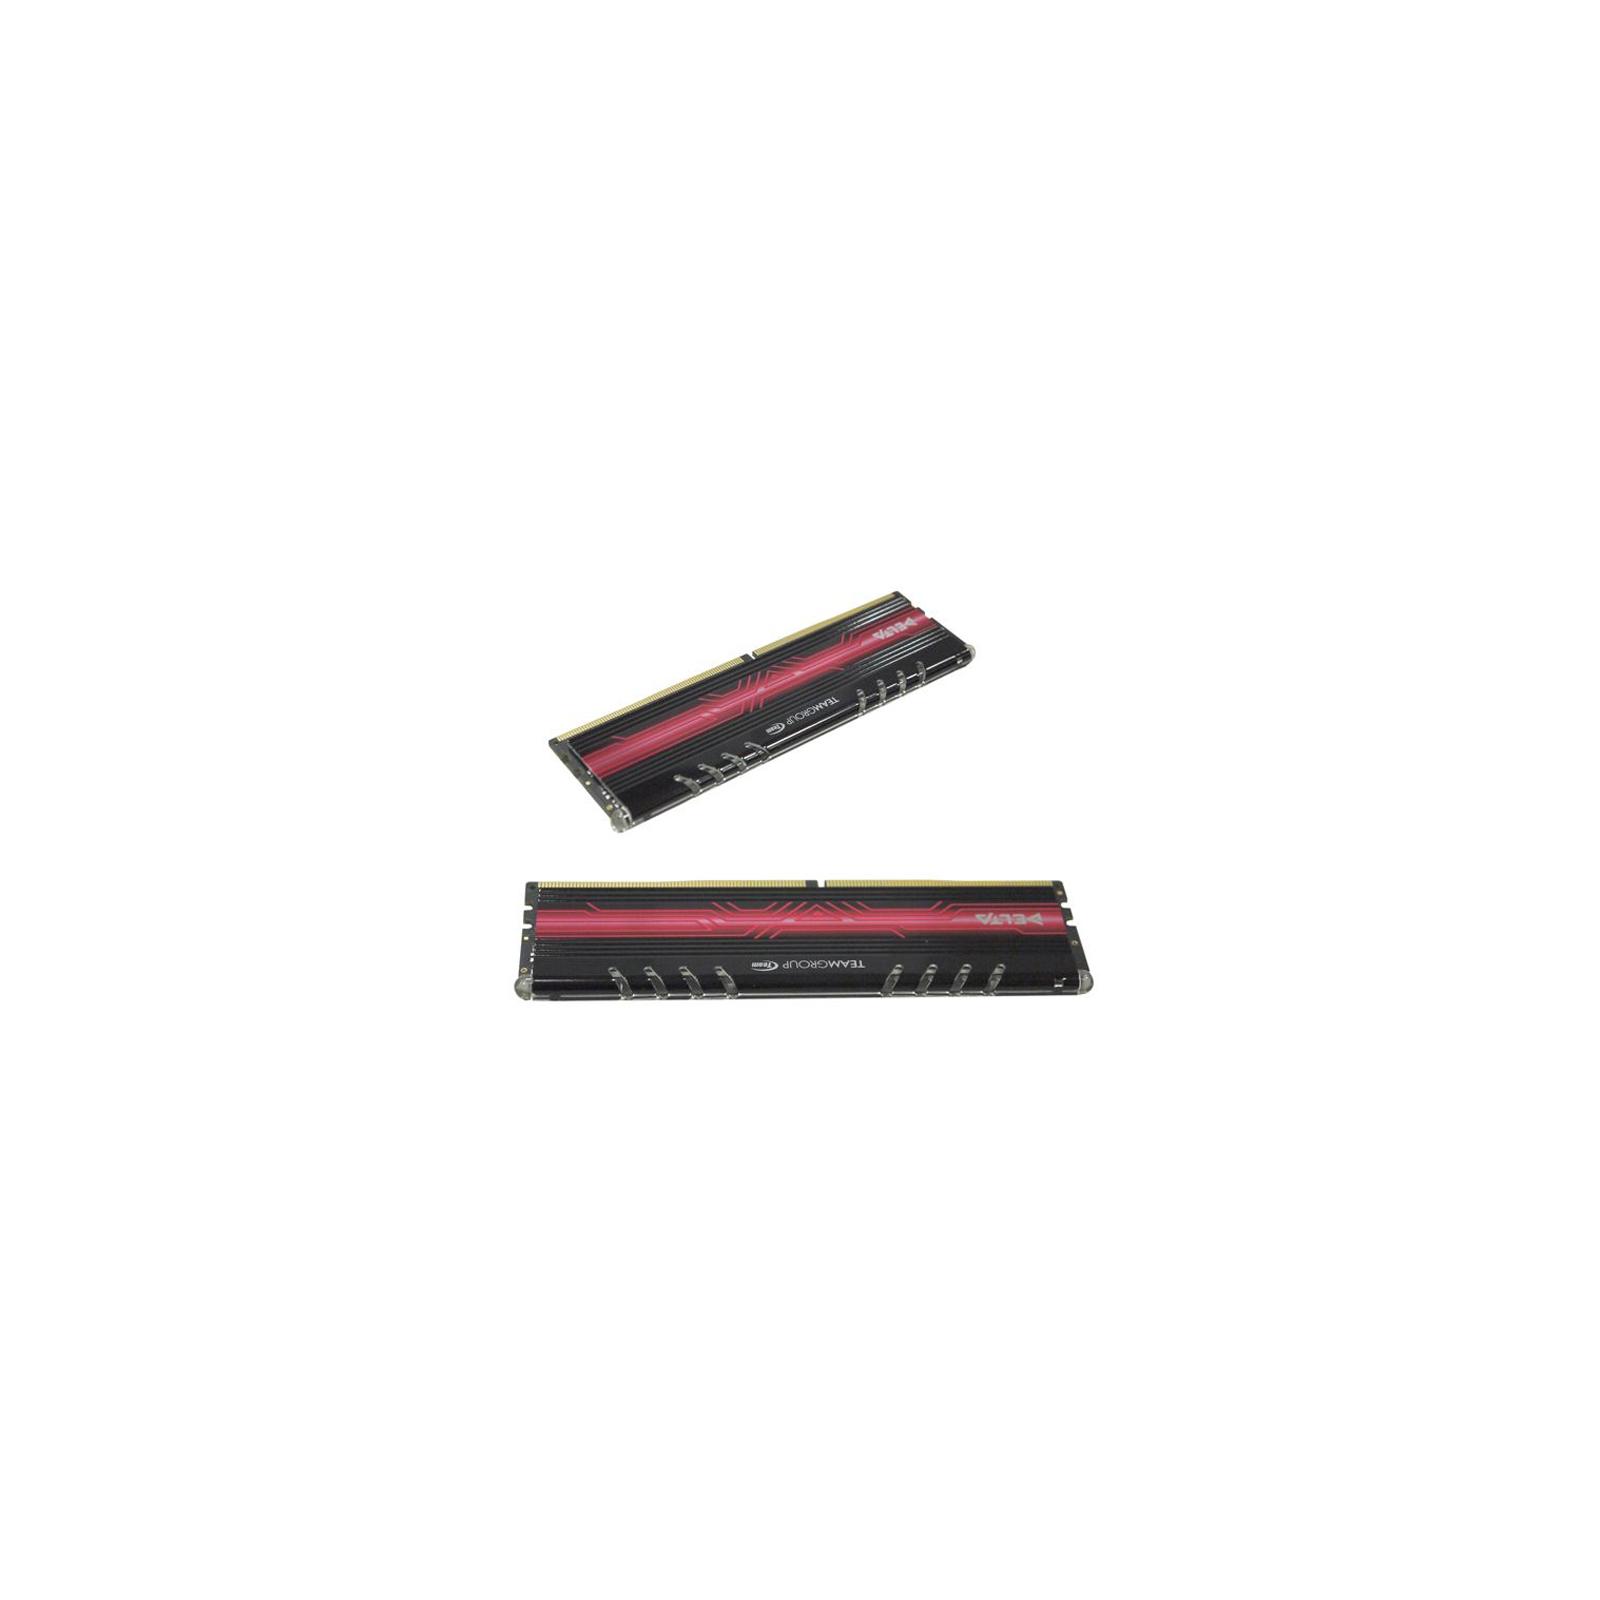 Модуль памяти для компьютера DDR4 8GB (2x4GB) 2400 MHz Delta Red LED Team (TDTRD48G2400HC15ADC01) изображение 2